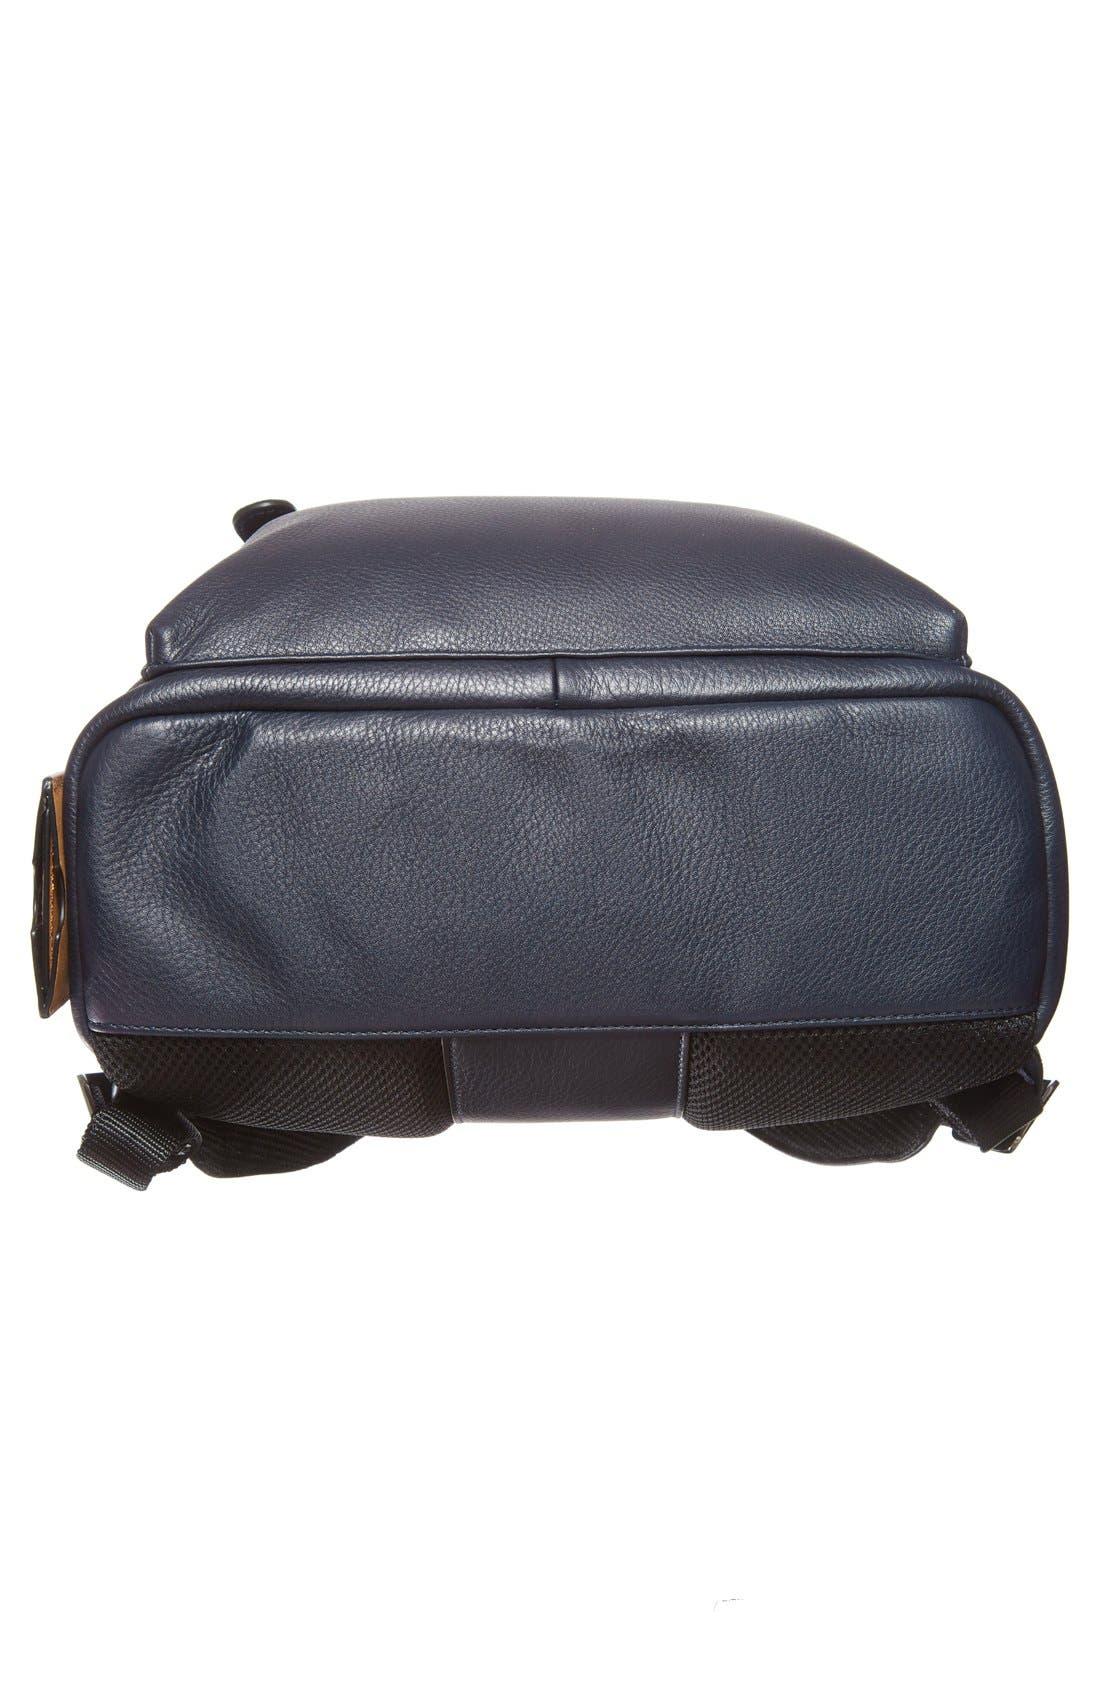 TED BAKER LONDON, 'Dollar' Leather Backpack, Alternate thumbnail 3, color, 410